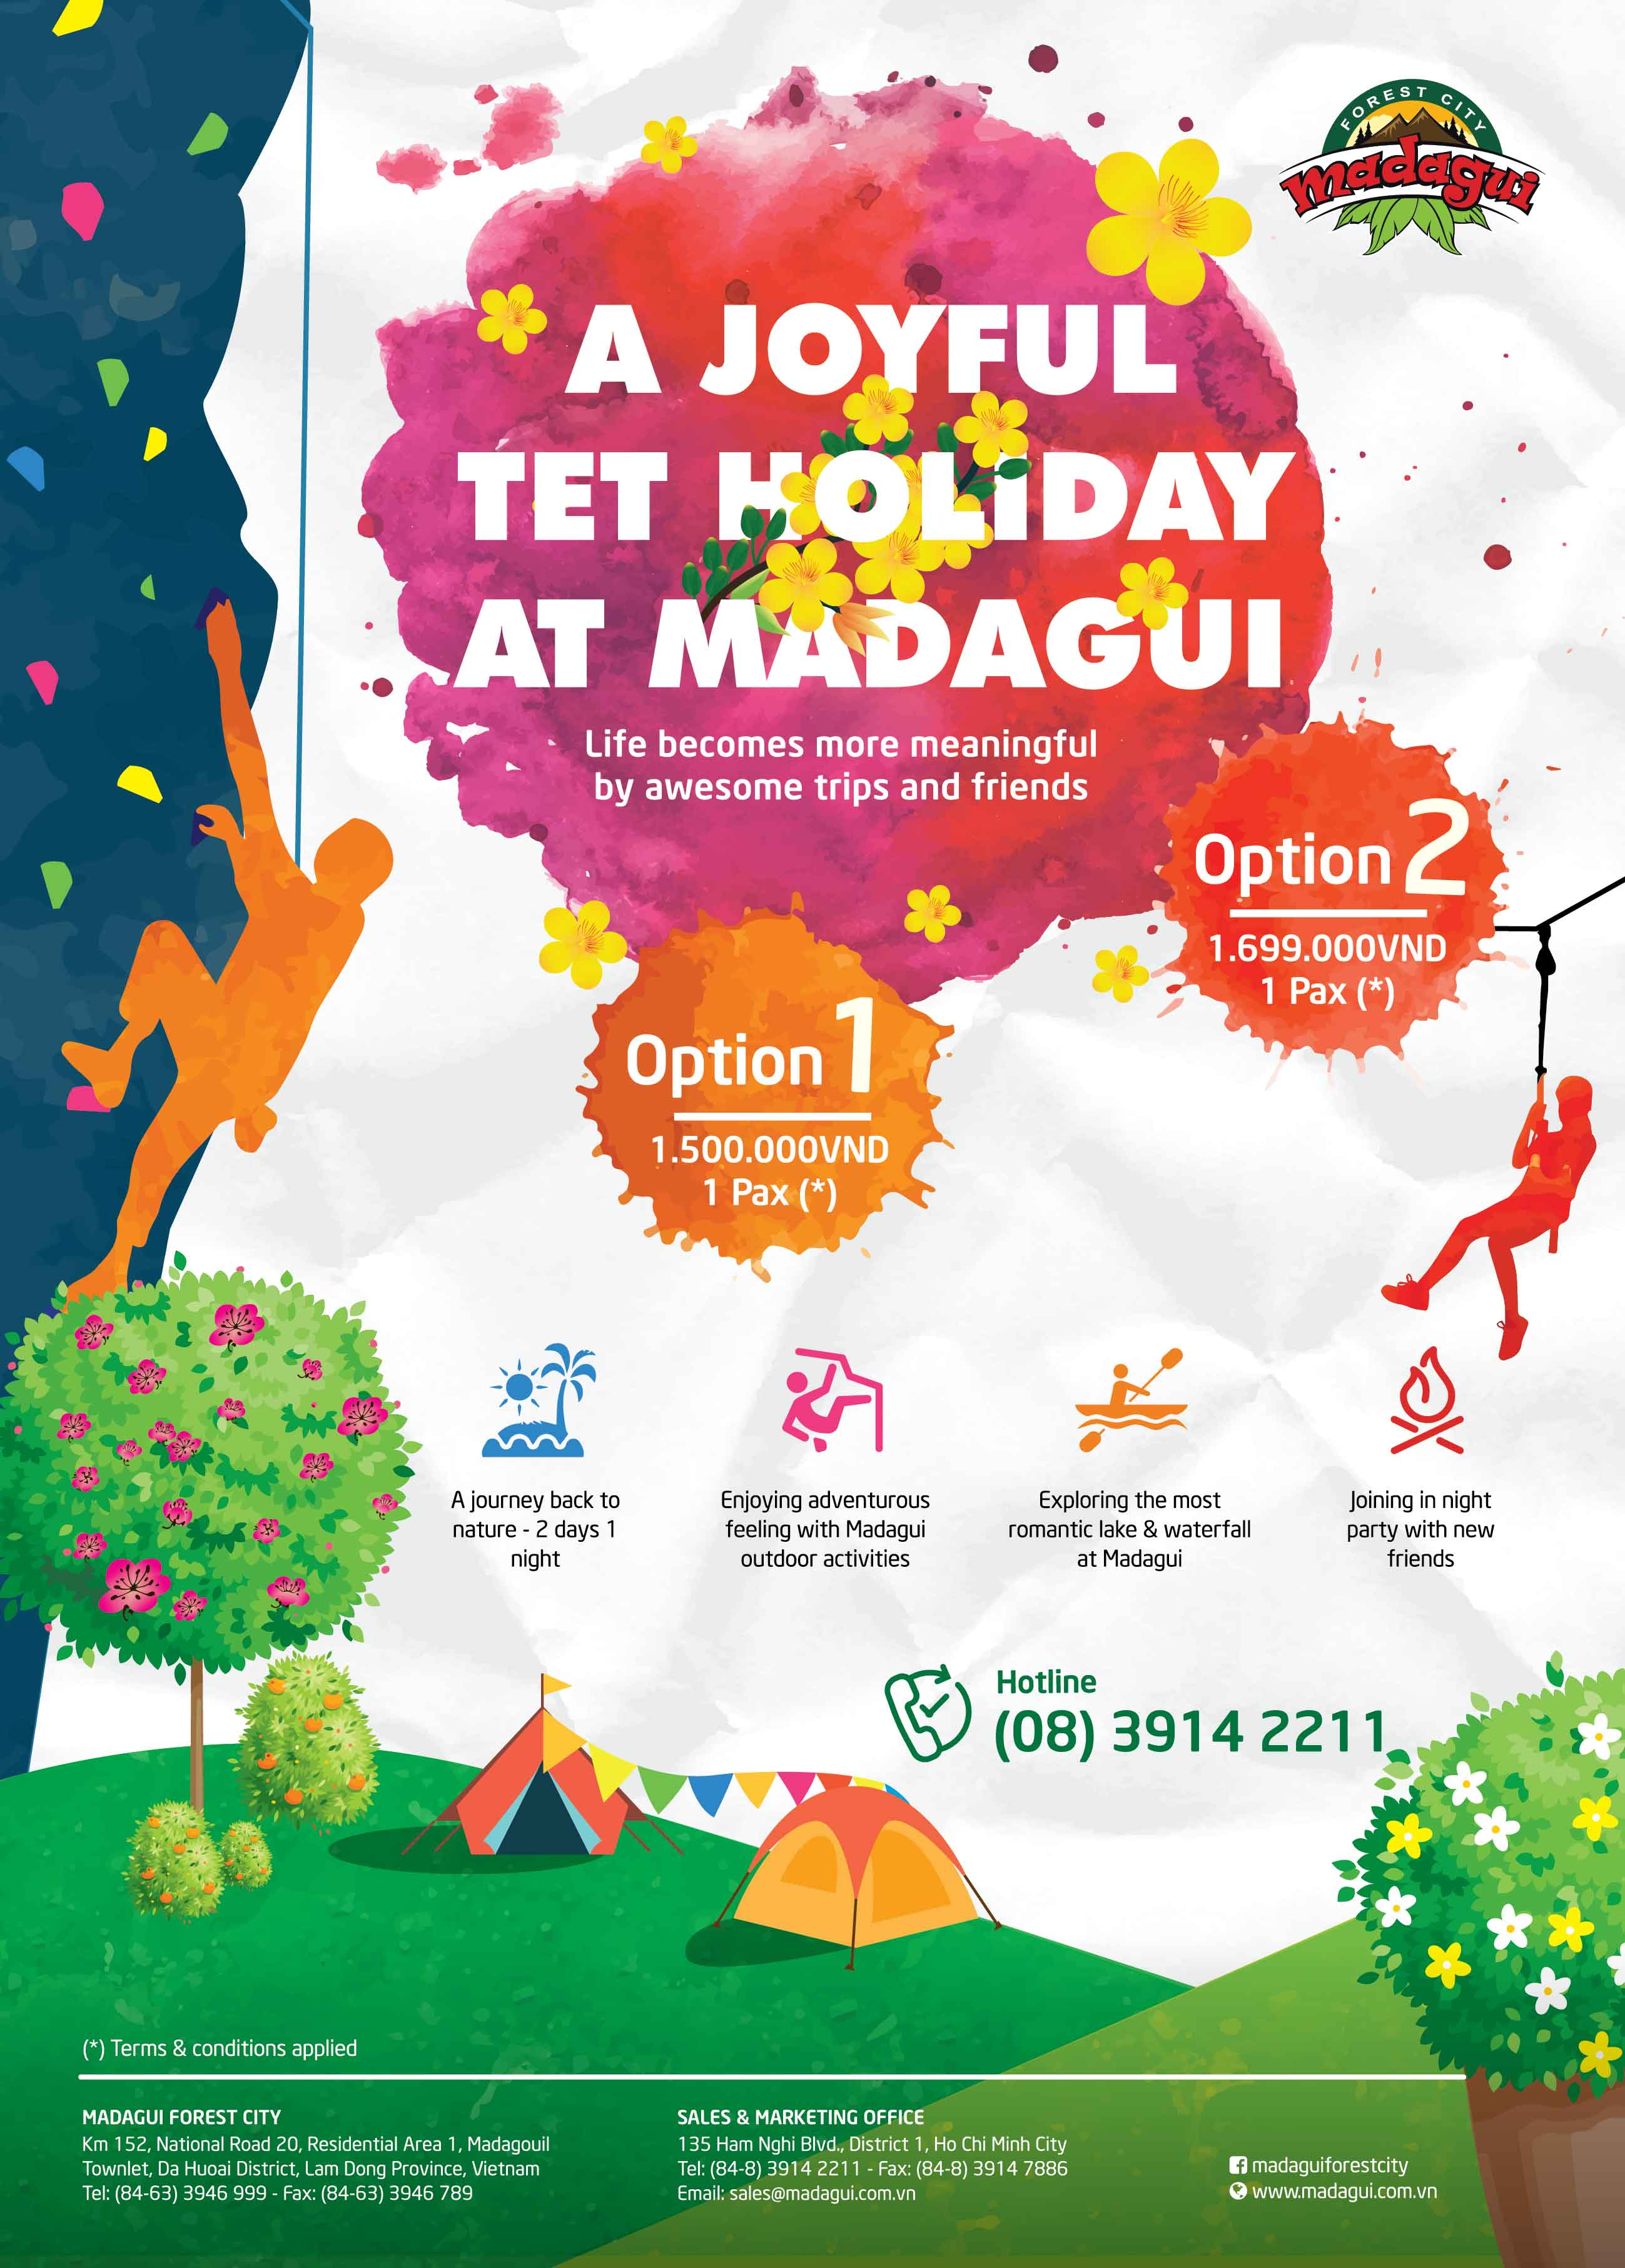 a joyful tet holiday at madagui madagui forest city. Black Bedroom Furniture Sets. Home Design Ideas